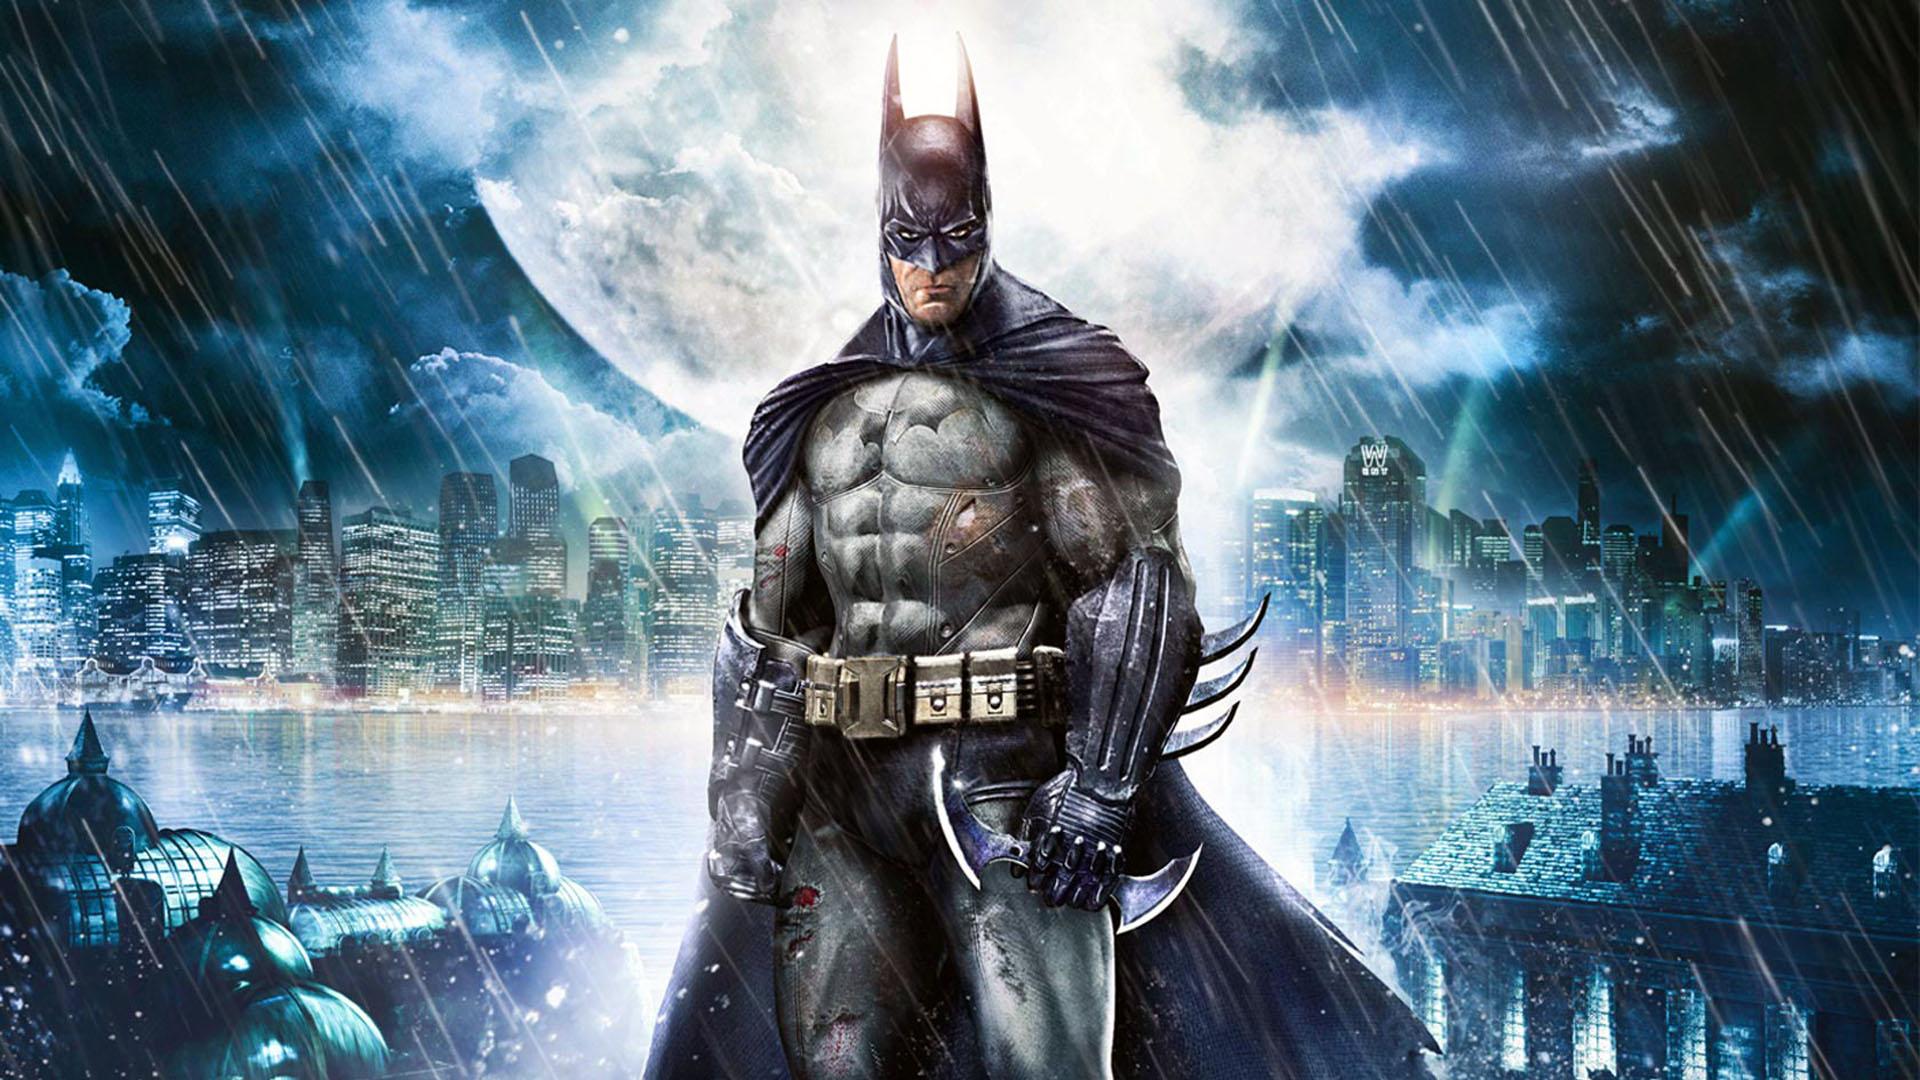 Batman Arkham Asylum Wallpaper HD